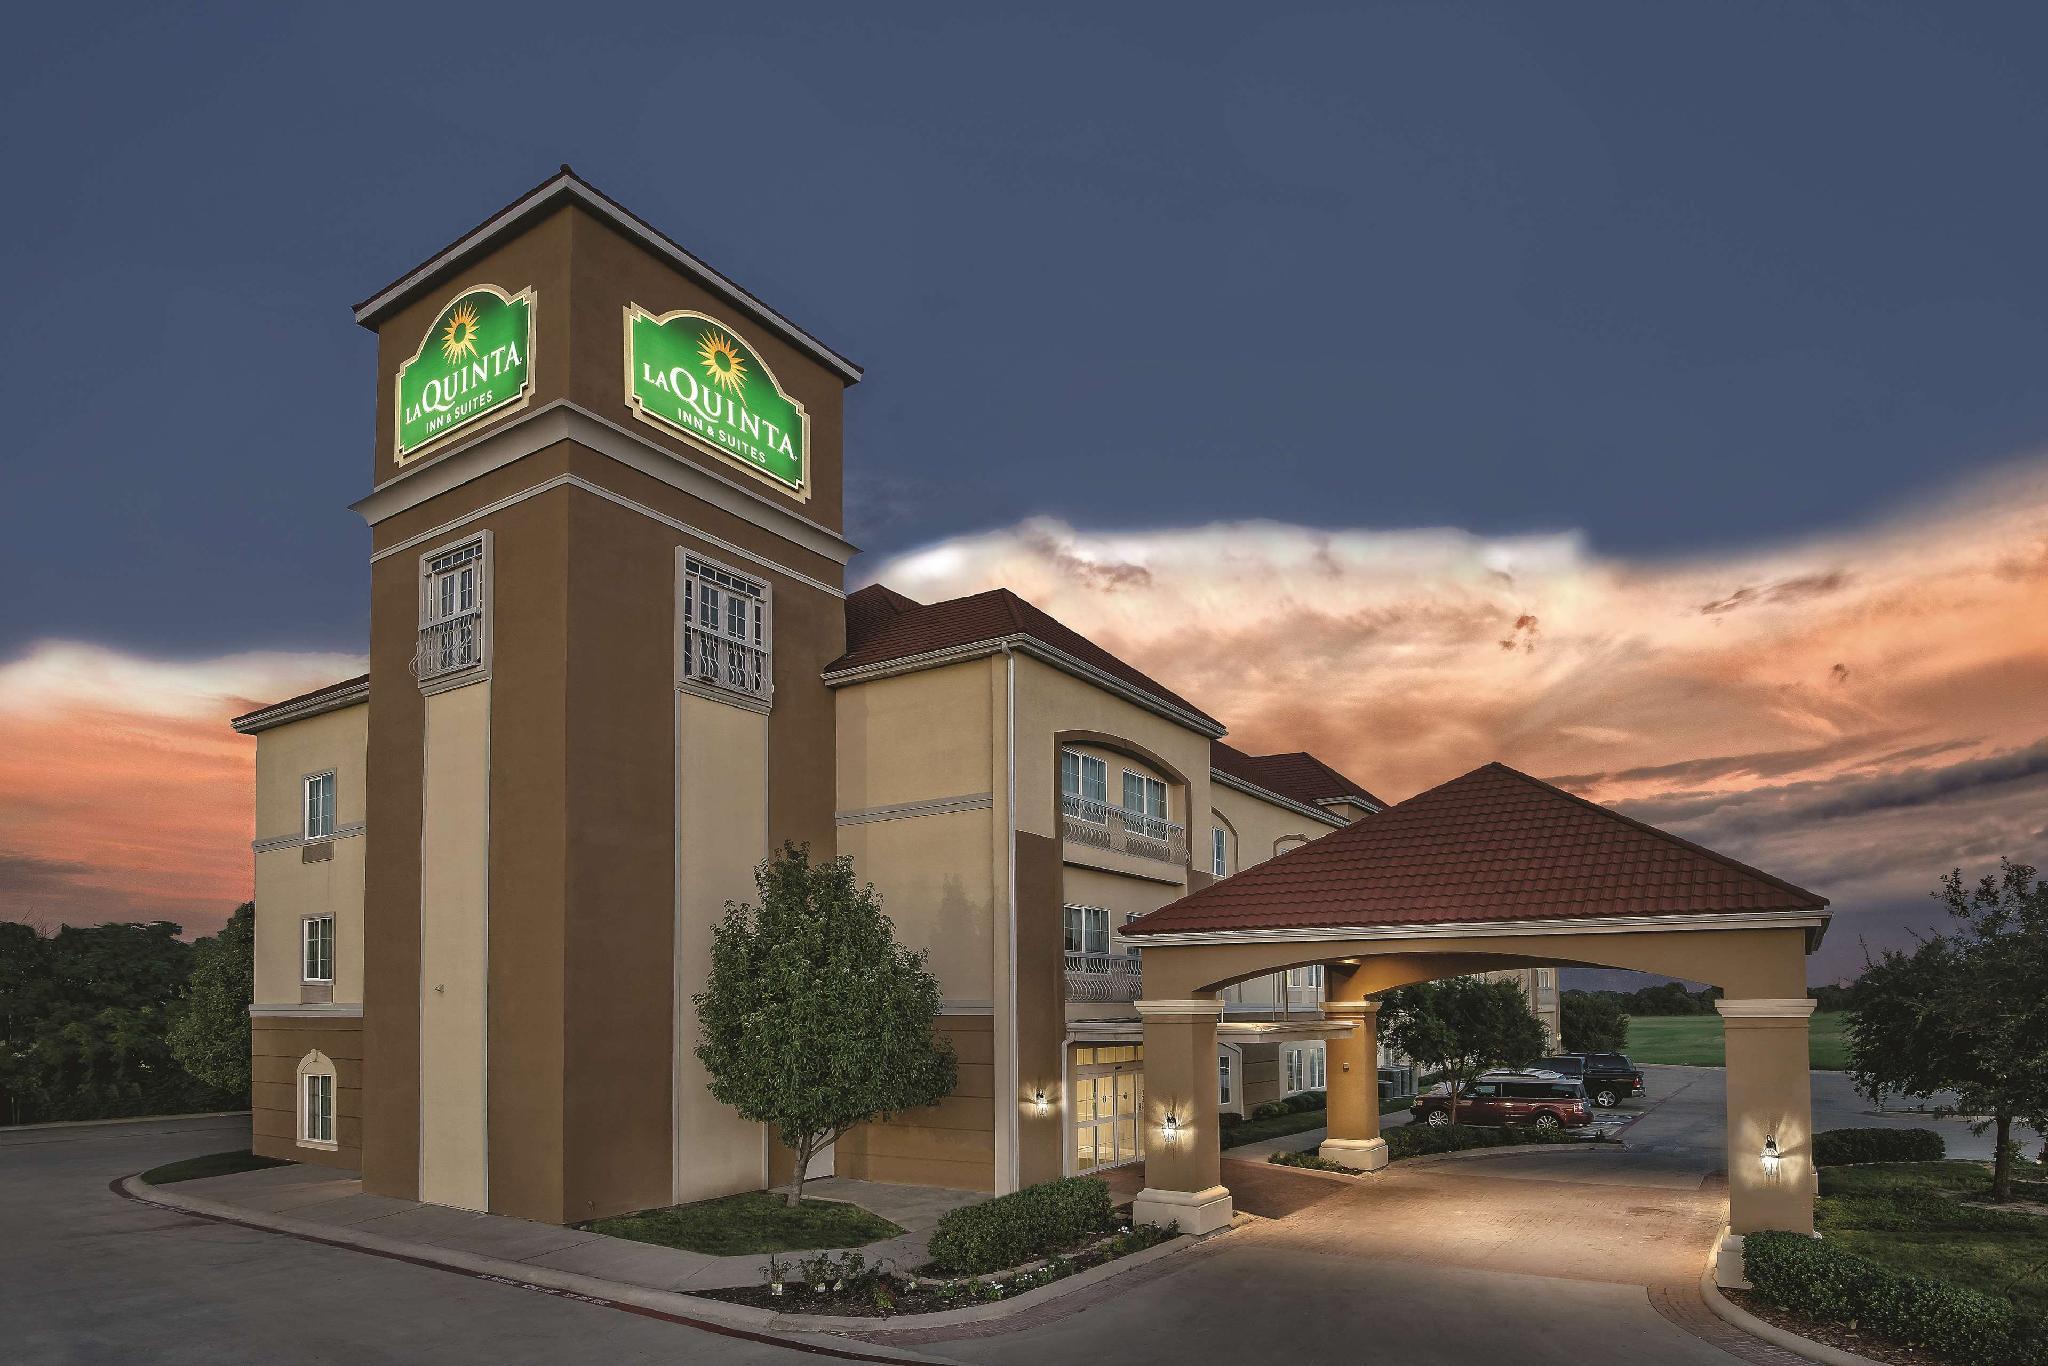 La Quinta Inn And Suites By Wyndham Stephenville